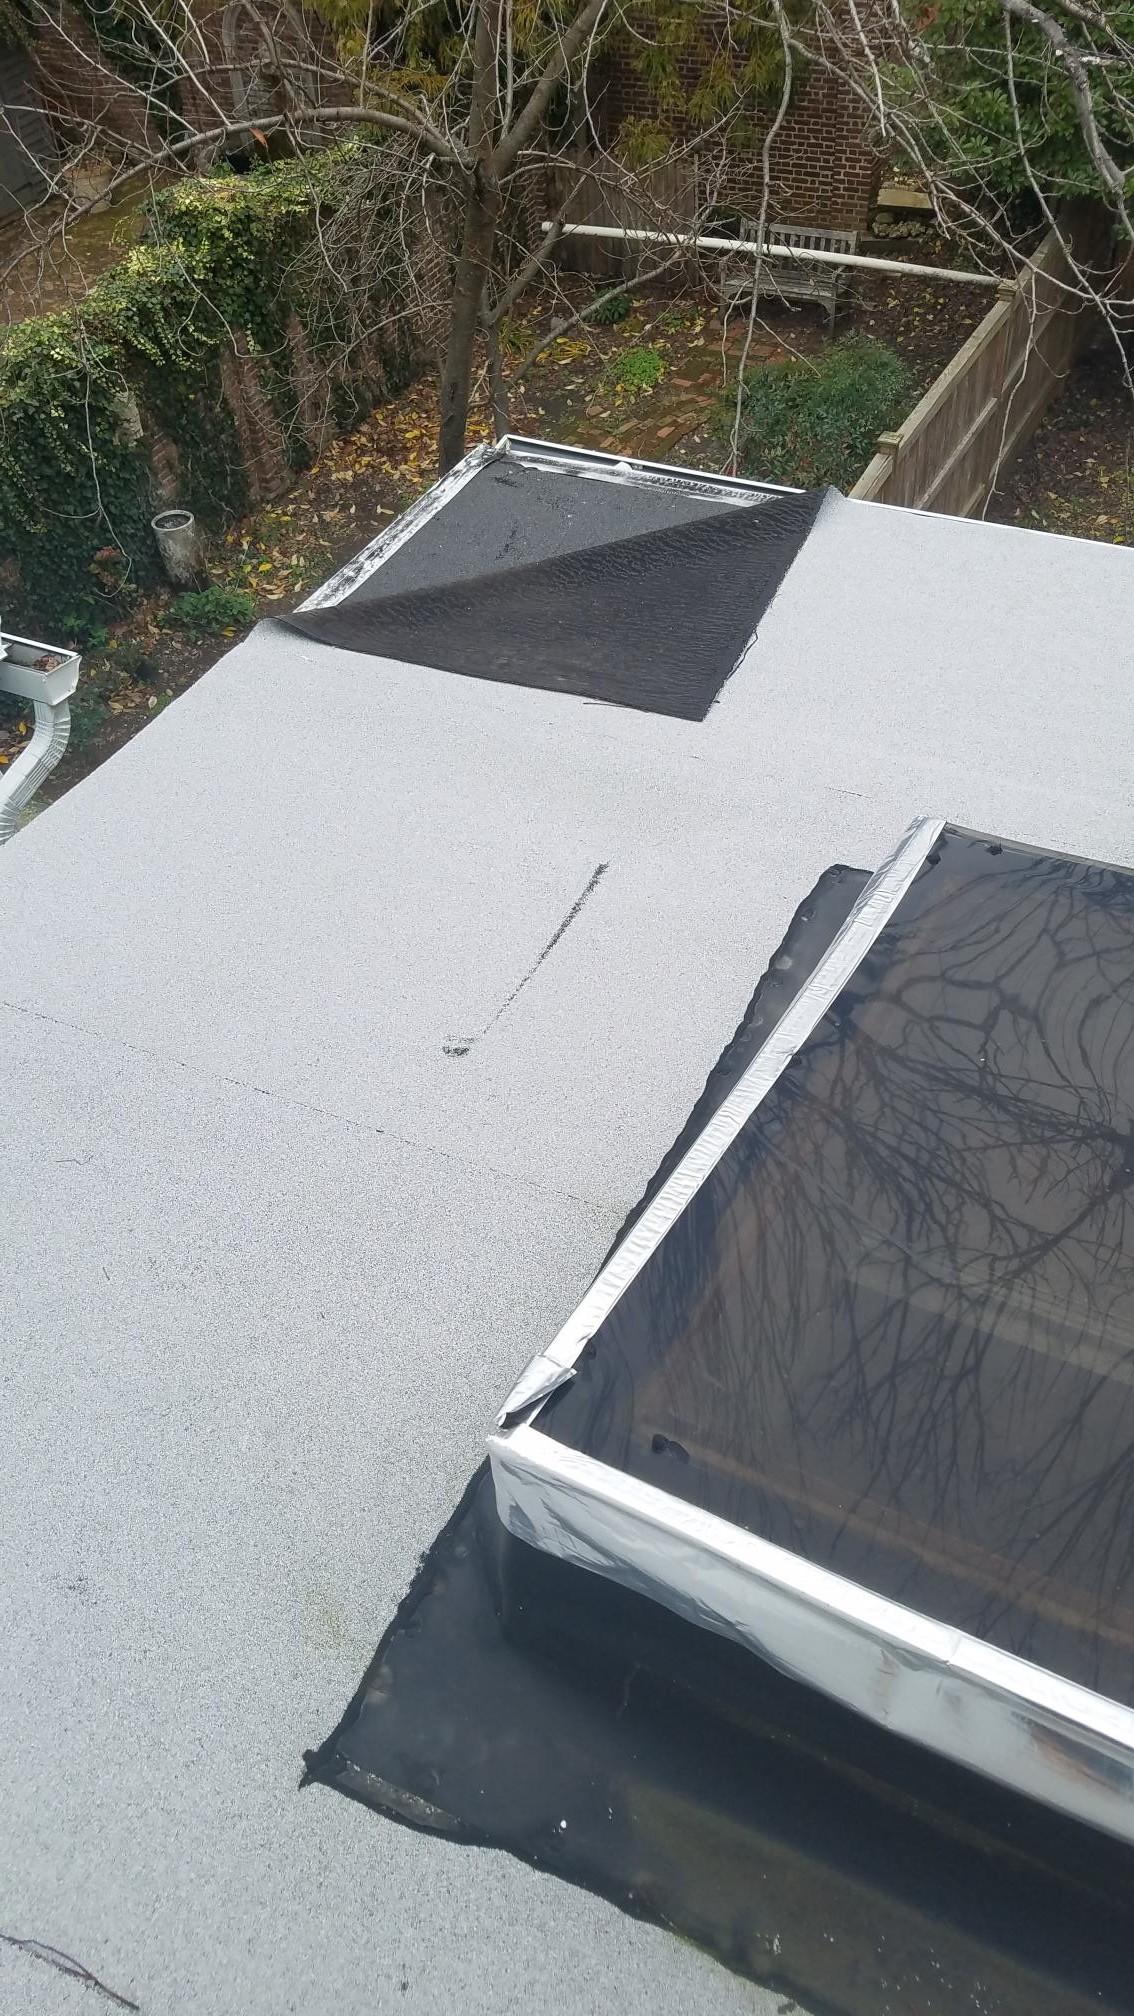 Flat Roof Damage Caused Leak